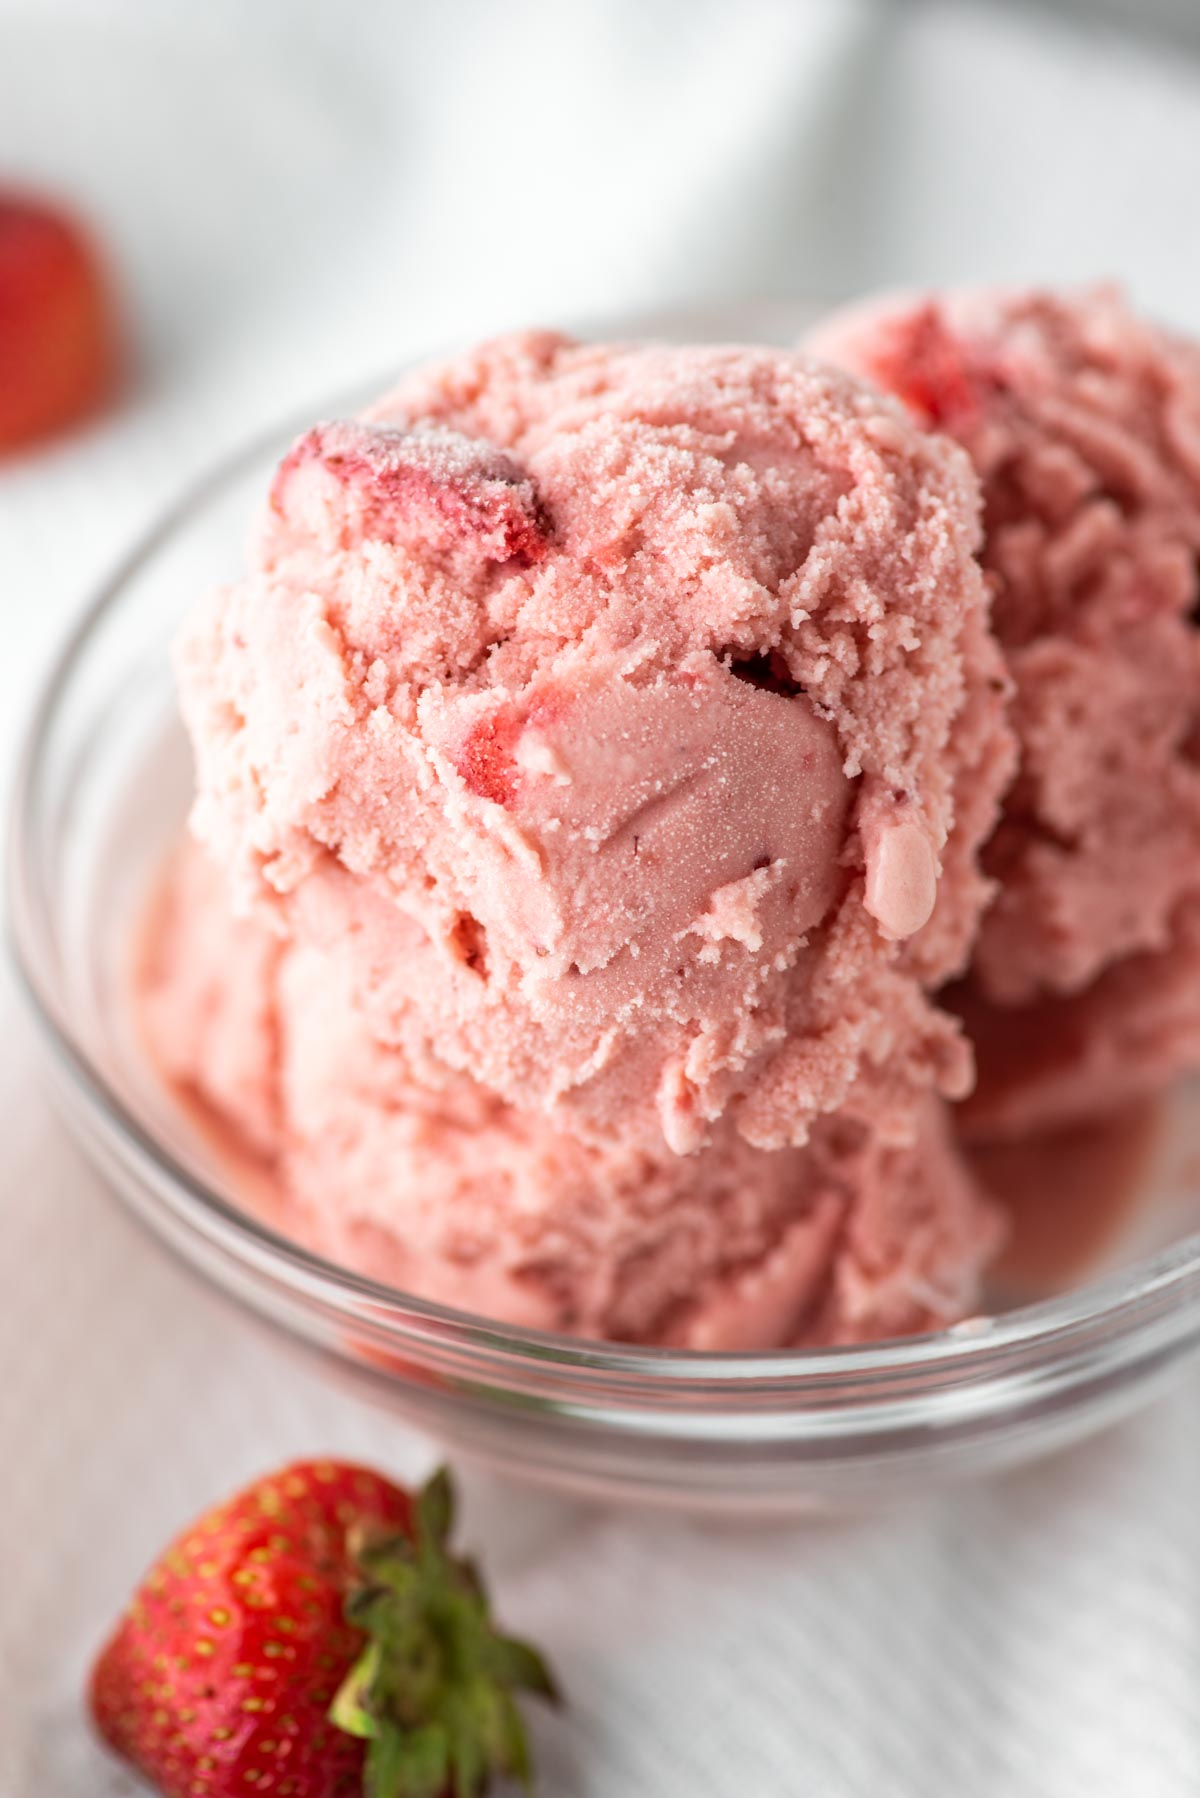 strawberry ice cream in glass bowl